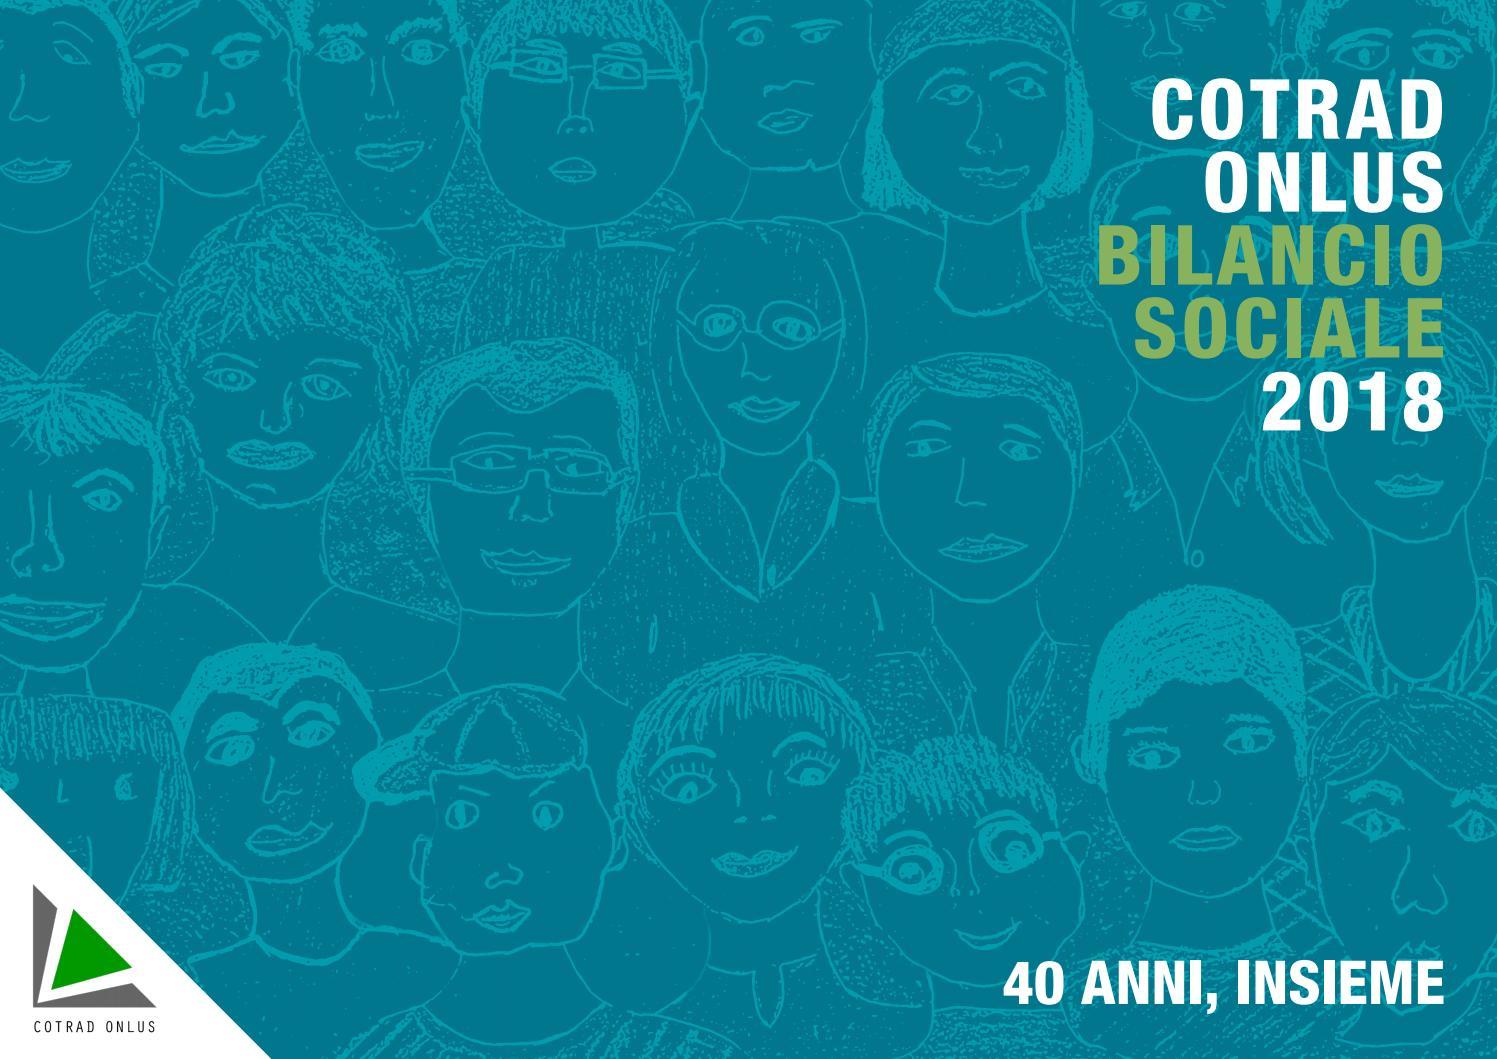 Bilancio Sociale Cotrad 2018 By Rueto Gc Issuu